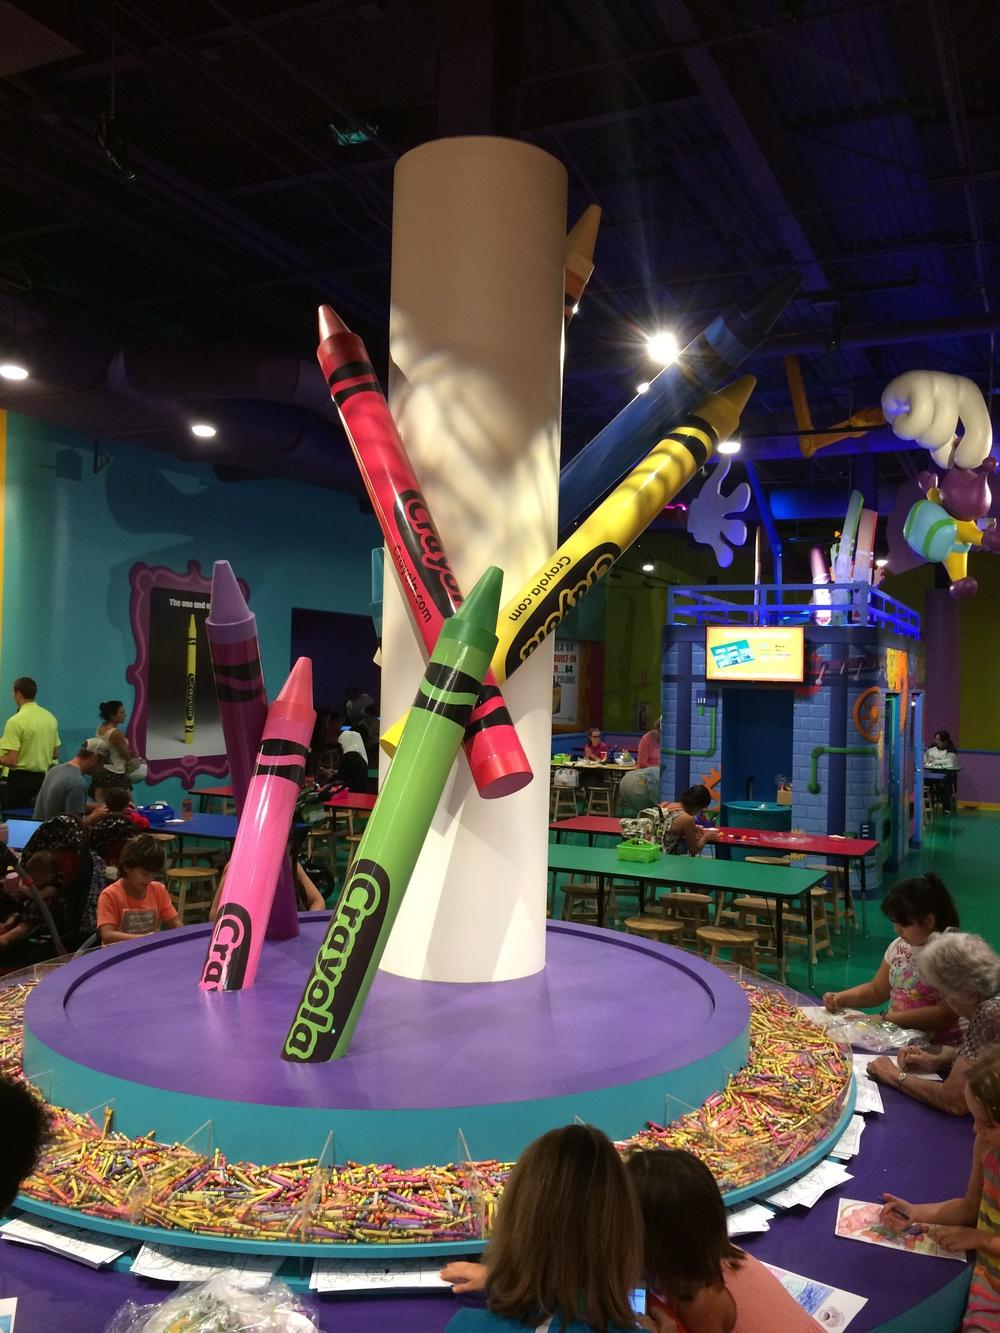 Crayola Experience Orlando, FL COLOSSAL CADDY